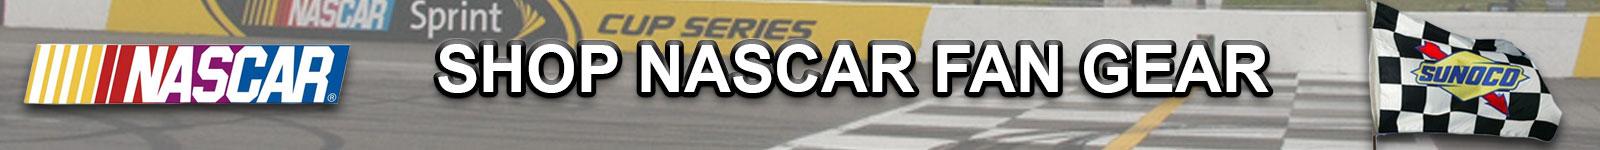 nascar-league-banner.jpg